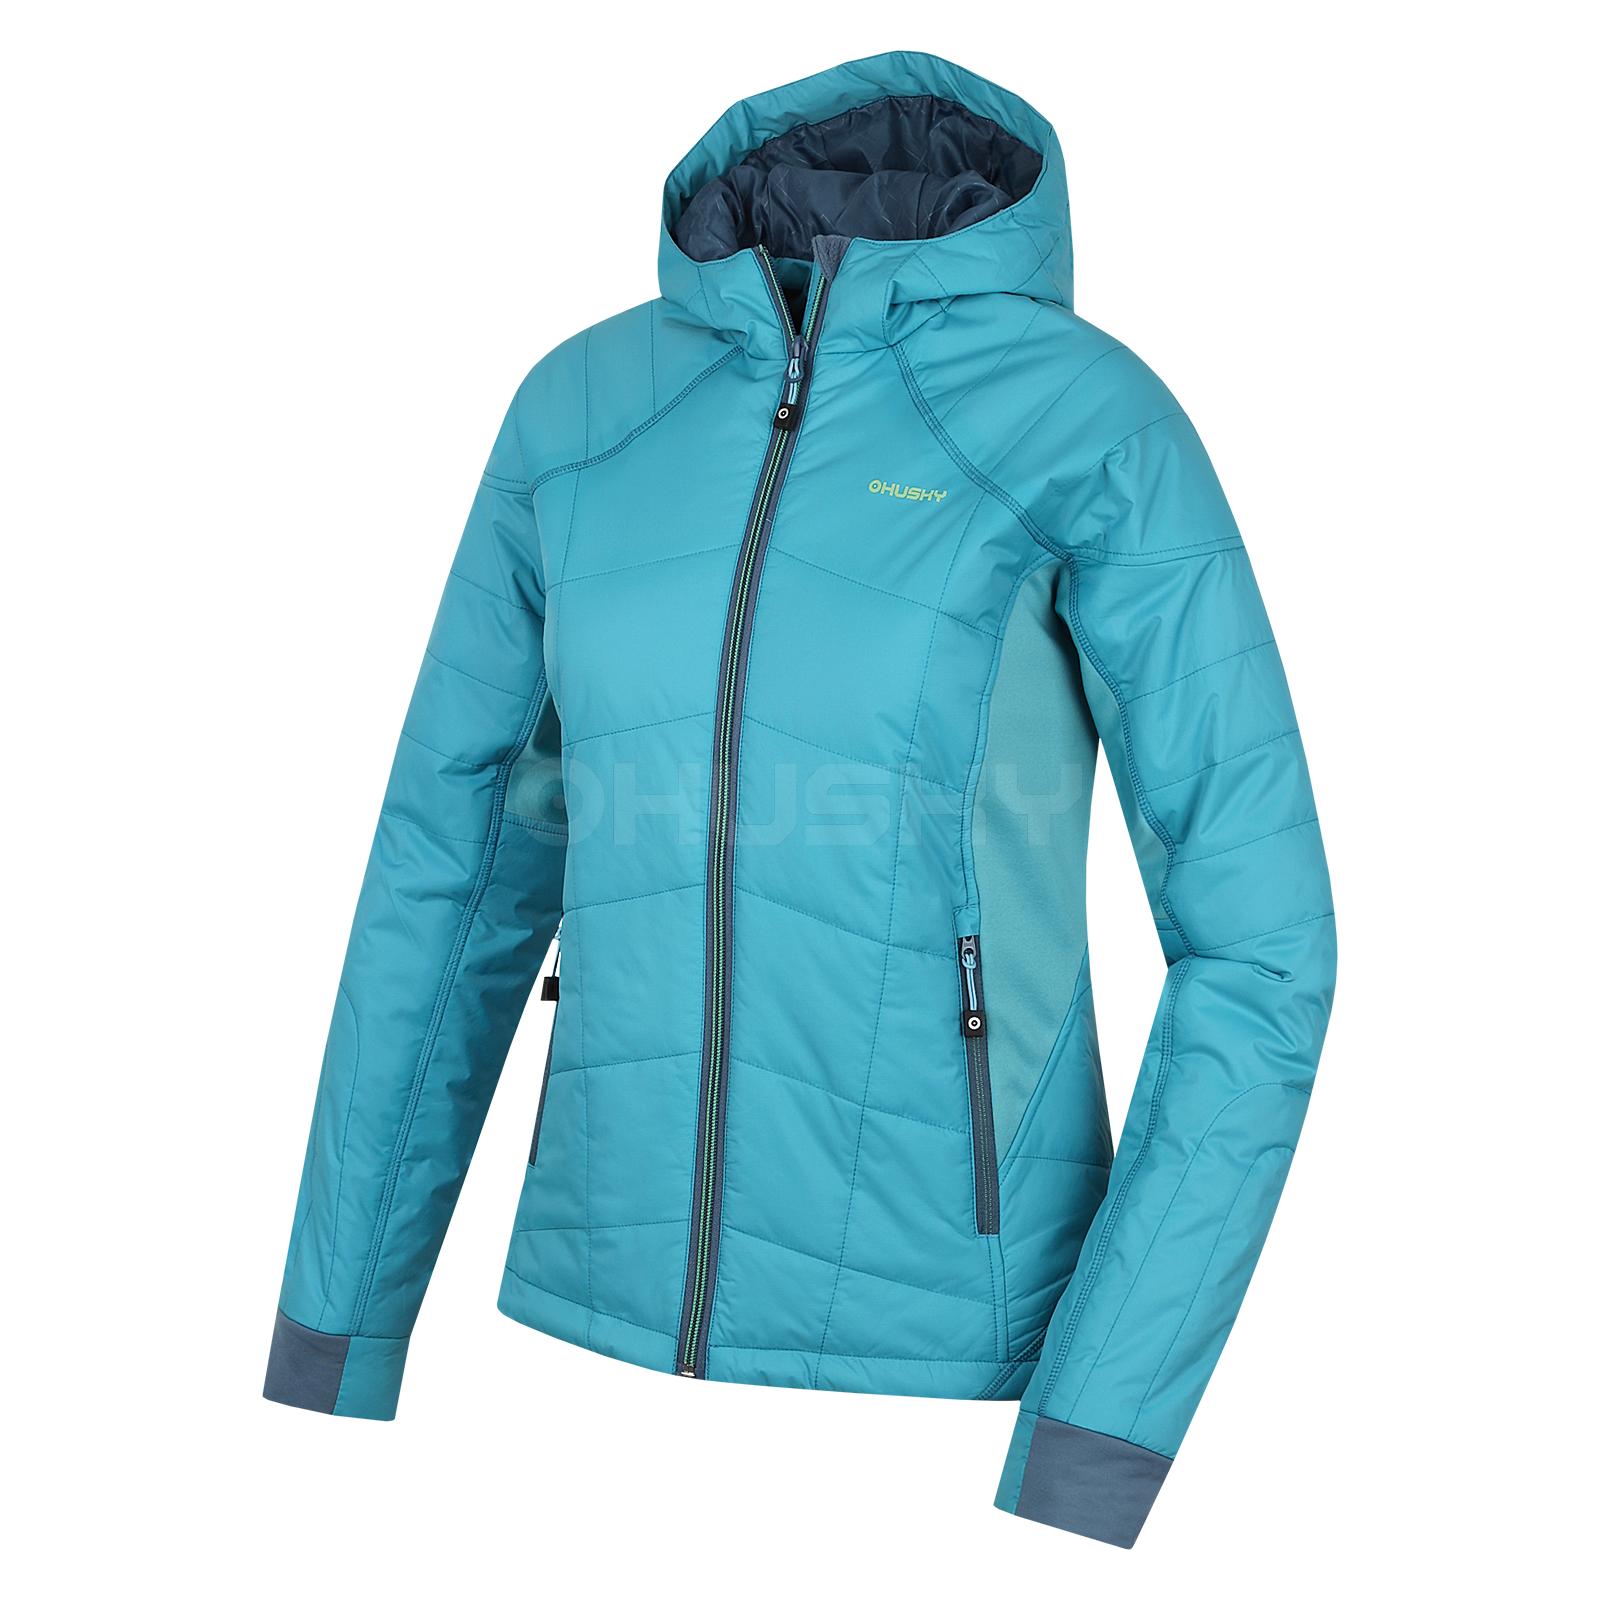 Husky Dámská outdoor bunda Naven L modrá Velikost: S